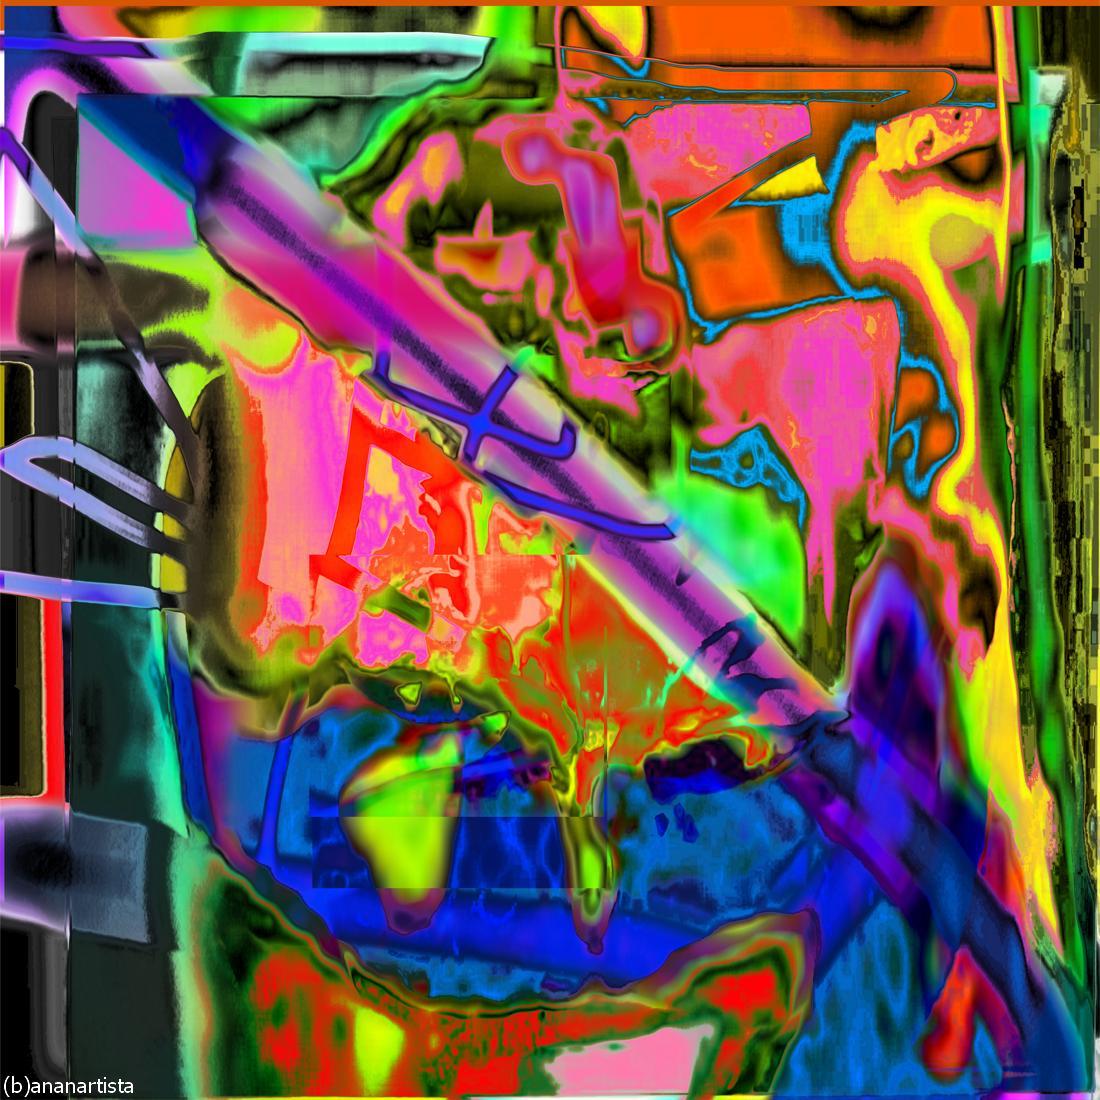 buffalo bill : digital painting art by (b)ananartista sbuff